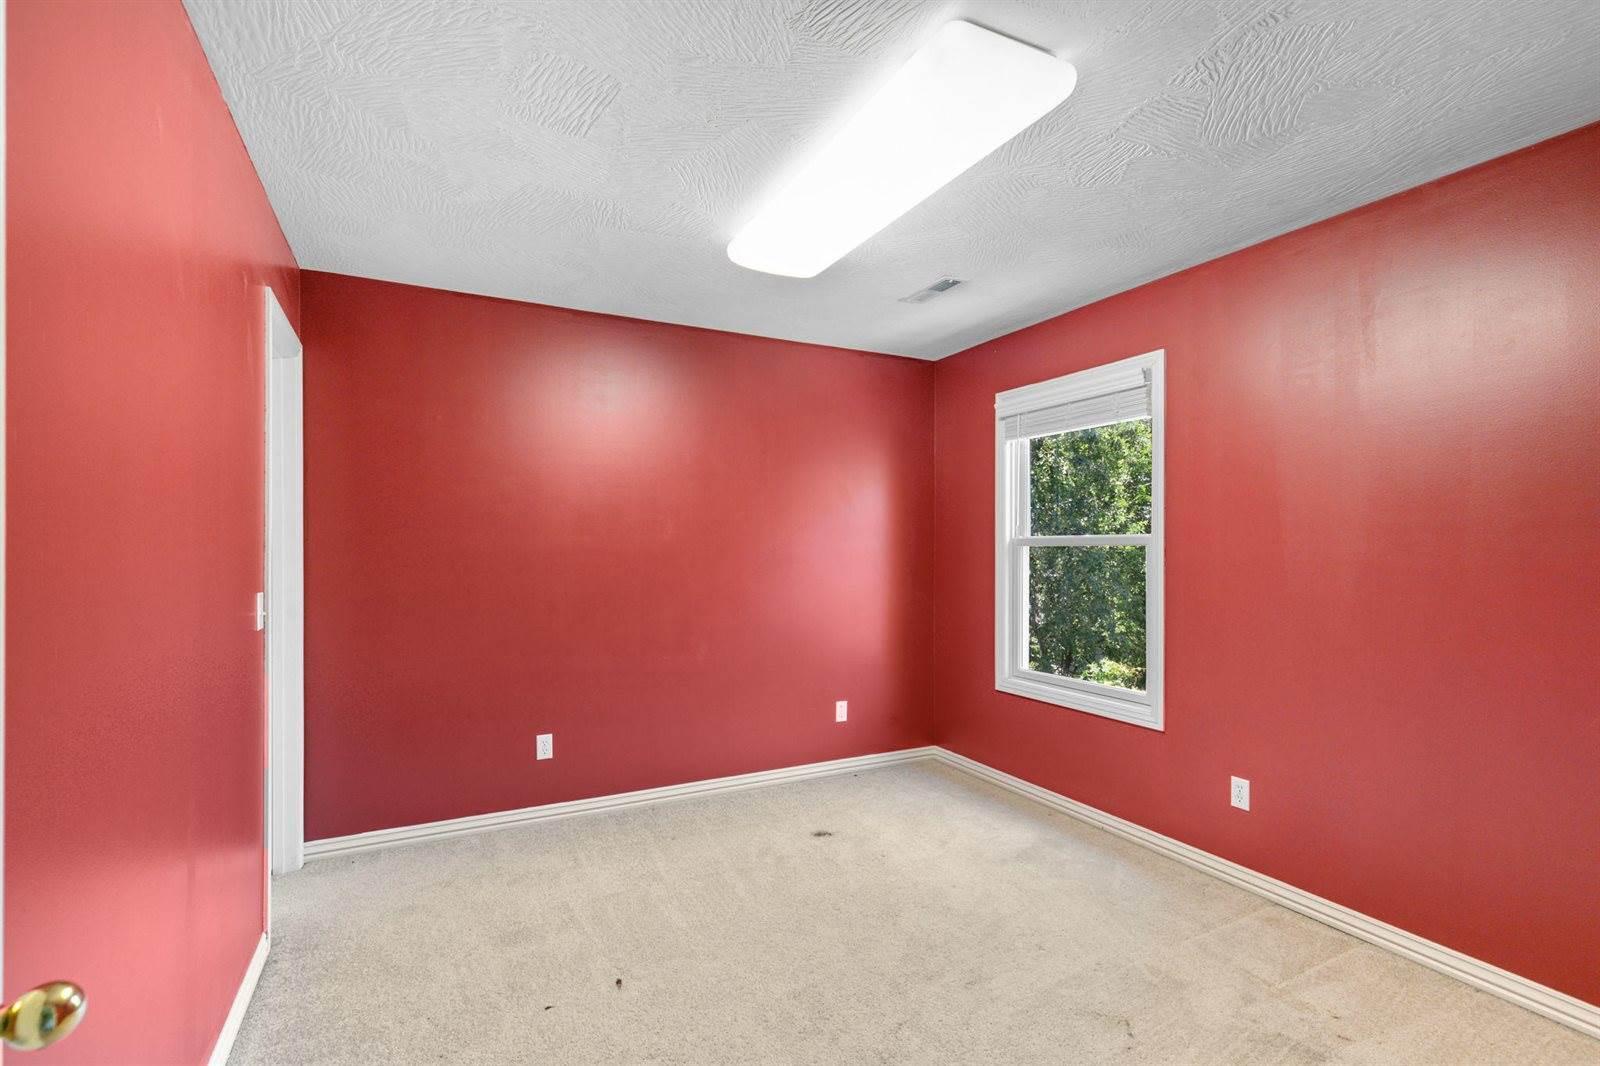 709 East Saint Charles, Ozark, MO 65721